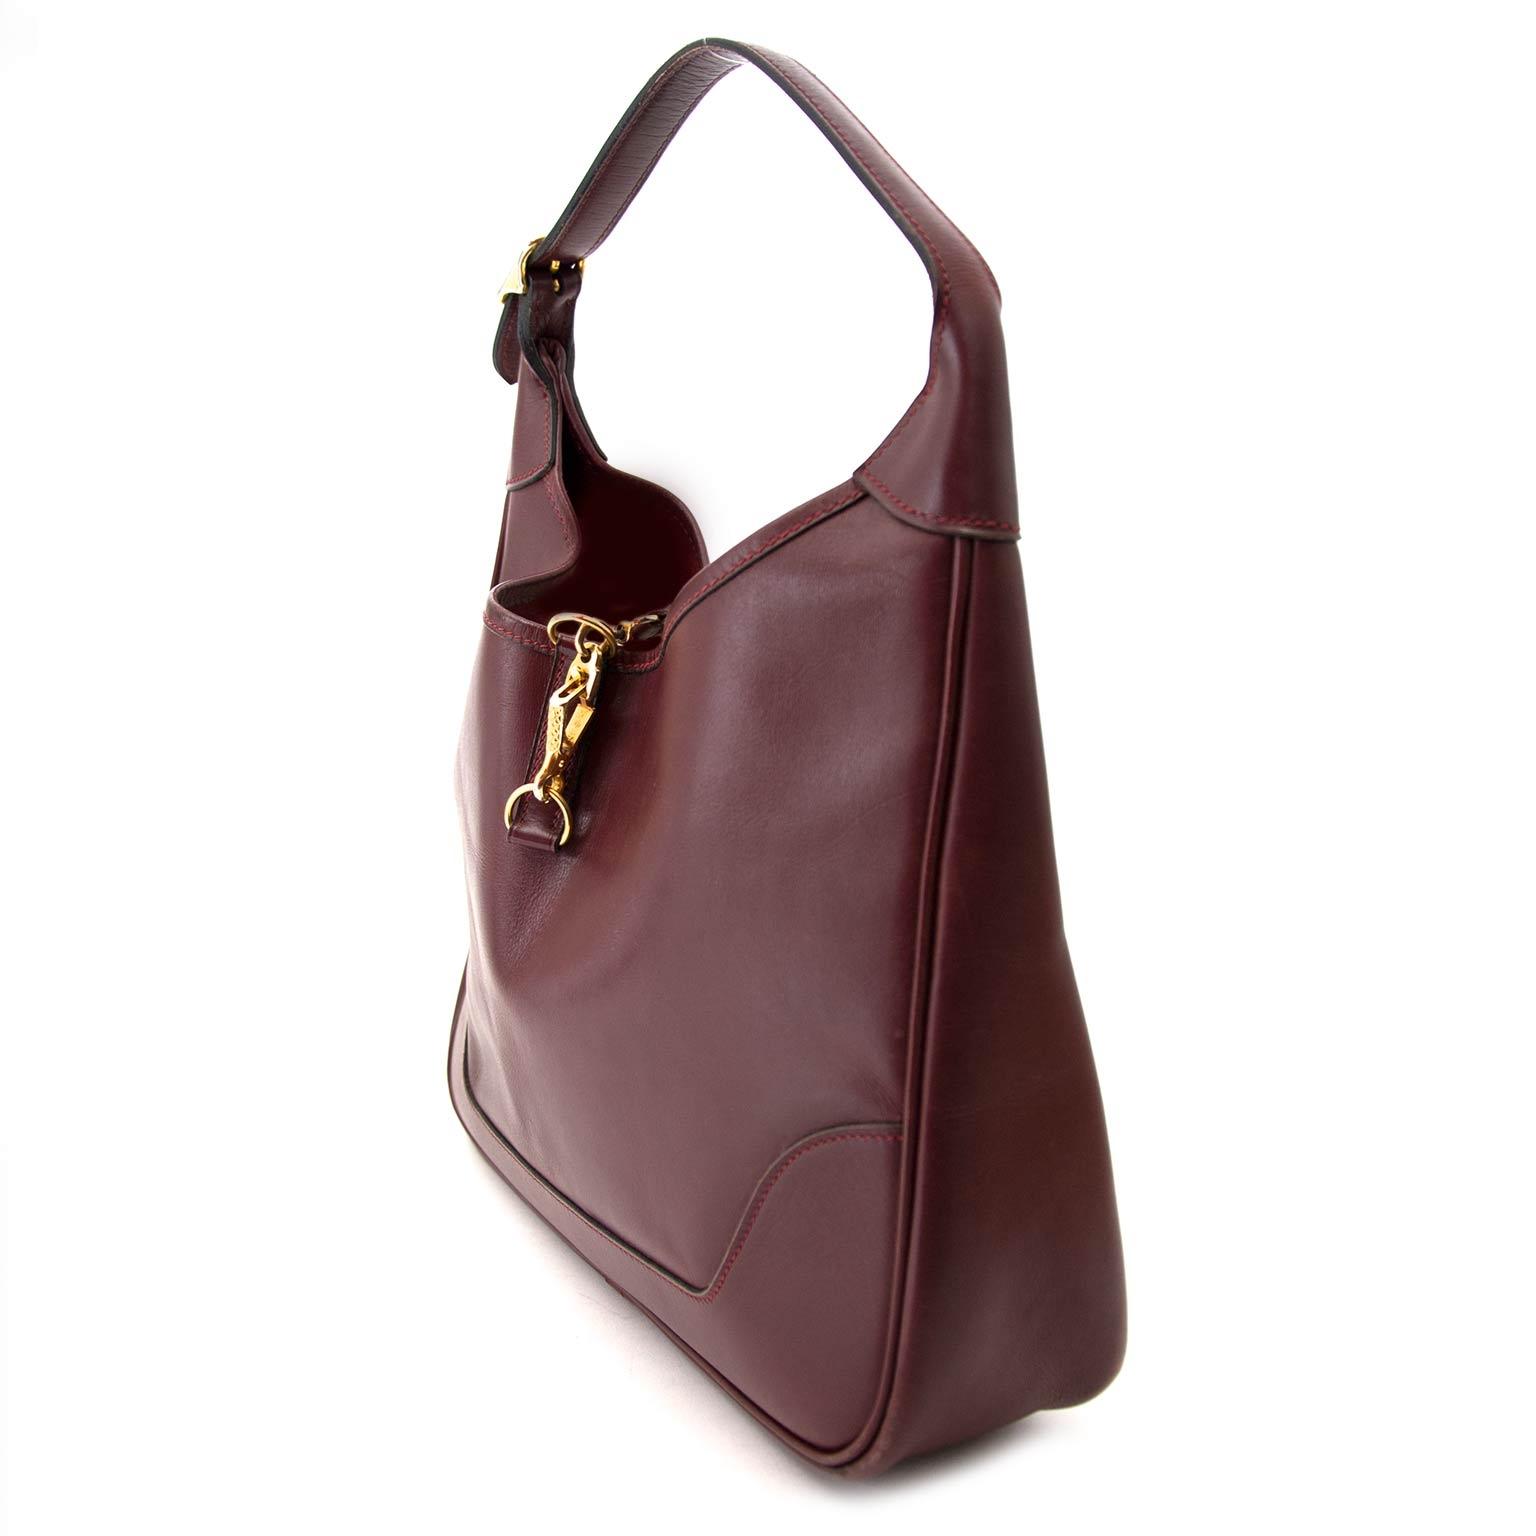 dce6aac7a7a ... shop safe and secure at labellov.com Hermès Trim Calf Leather Bordeaux  Hobo Bag